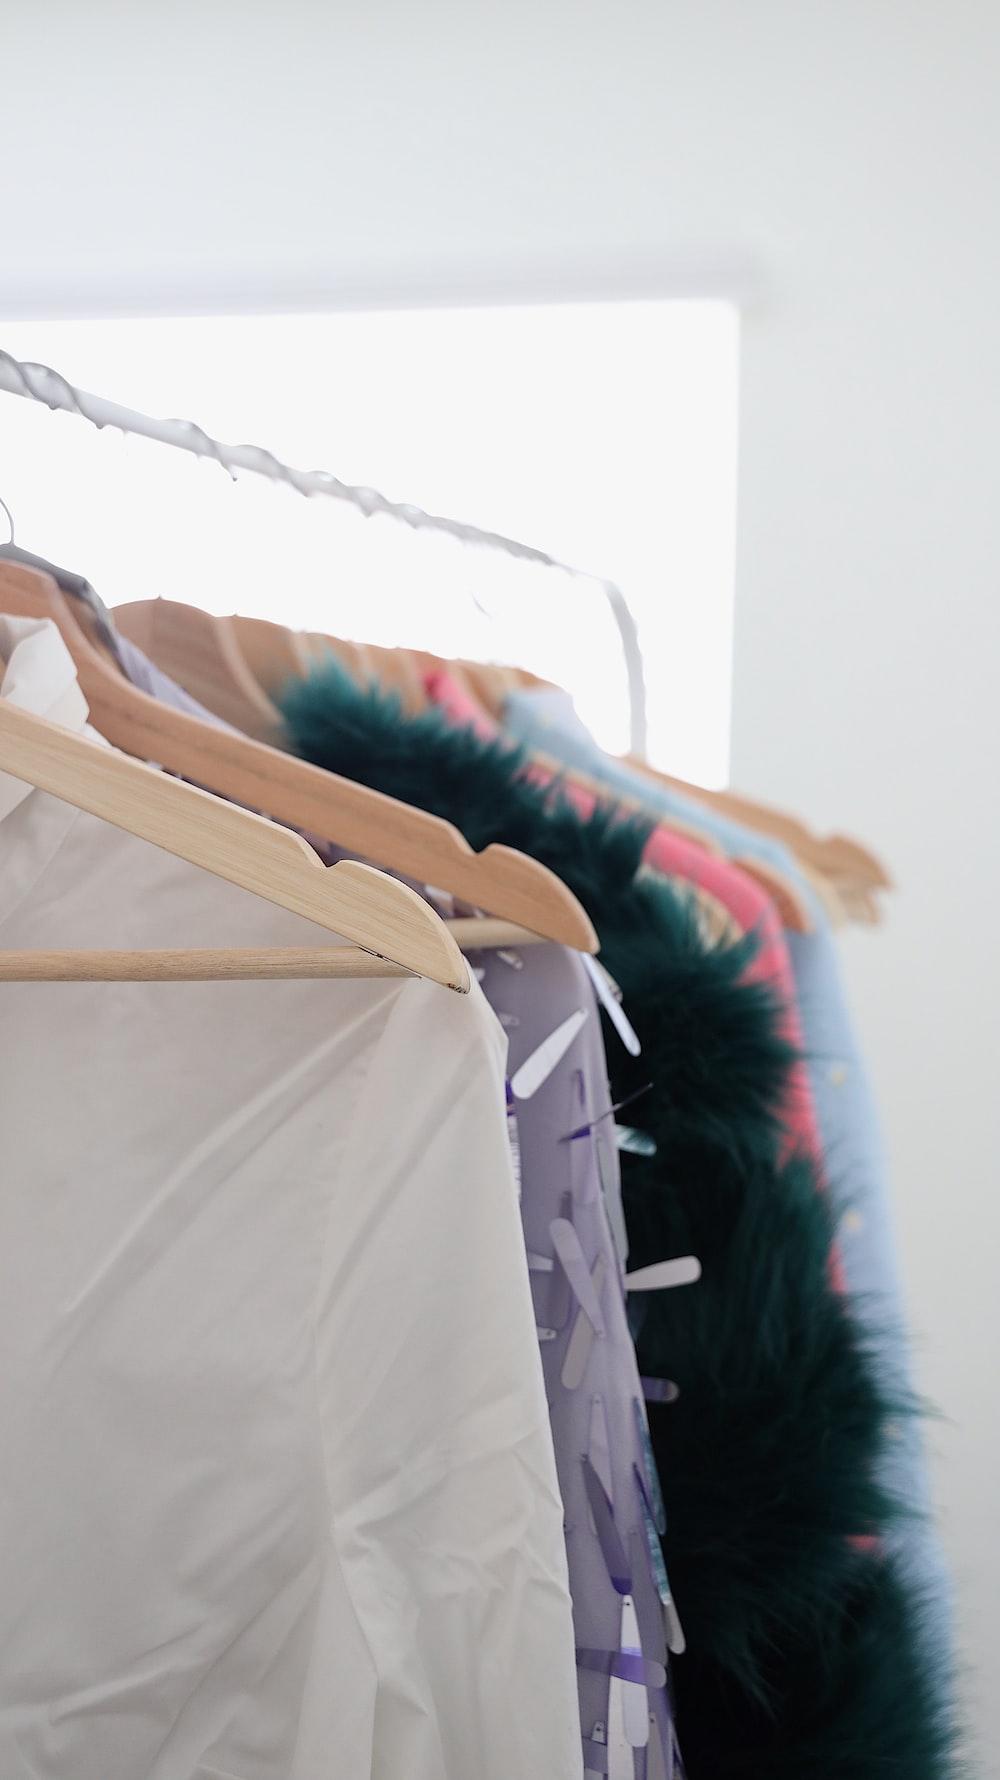 assorted garments hanging on rack